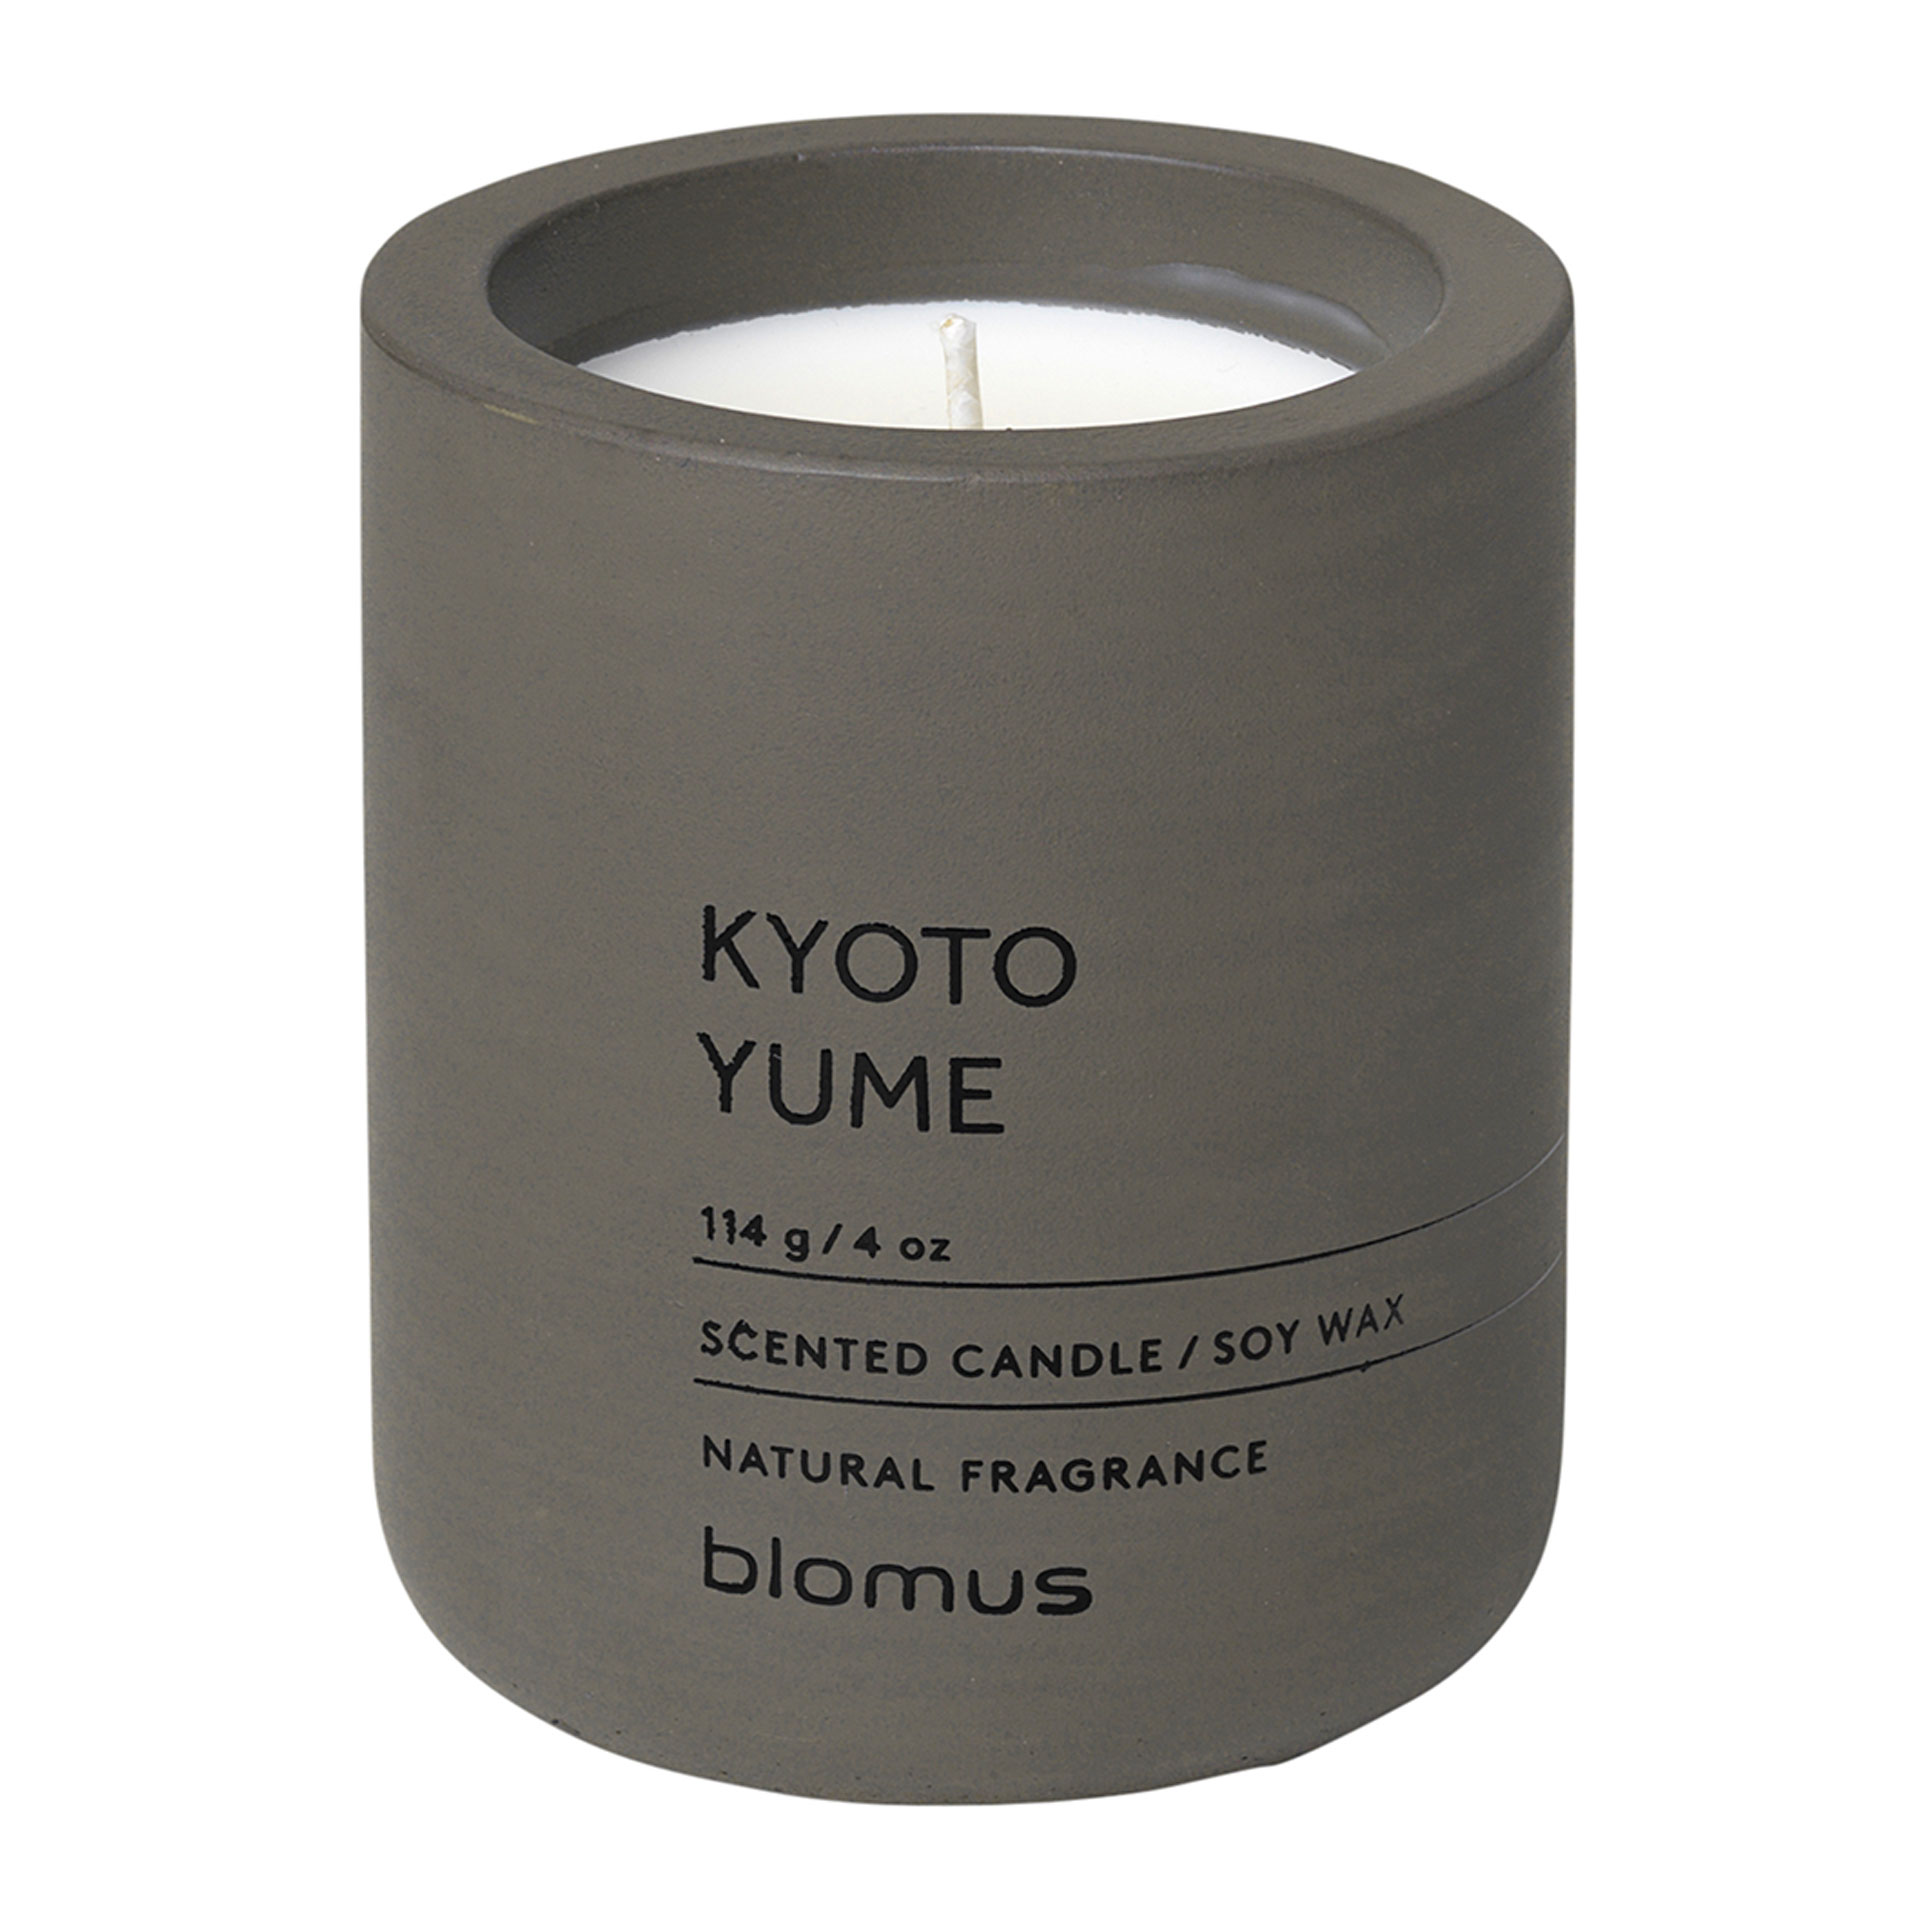 blomus FRAGA Duftkerze S Kyoto Yume - Tarmac